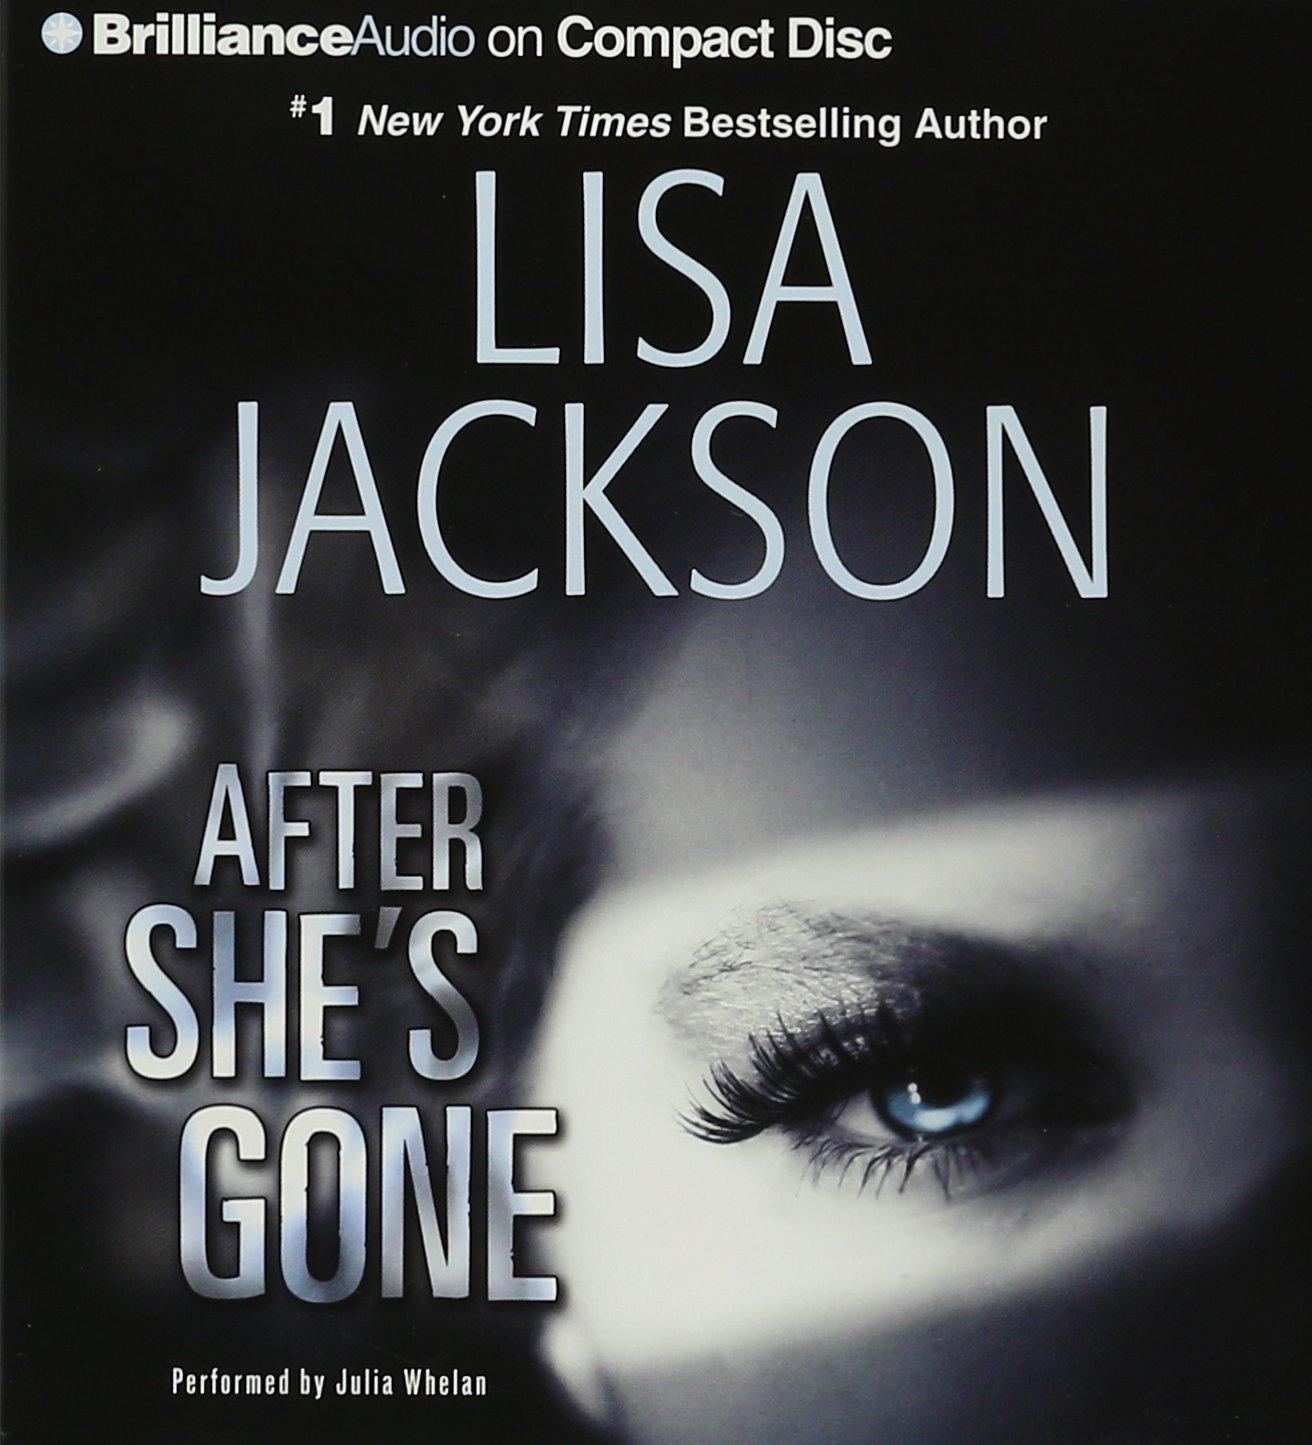 Amazon: After She's Gone (9781491531600): Lisa Jackson, Julia Whelan:  Books